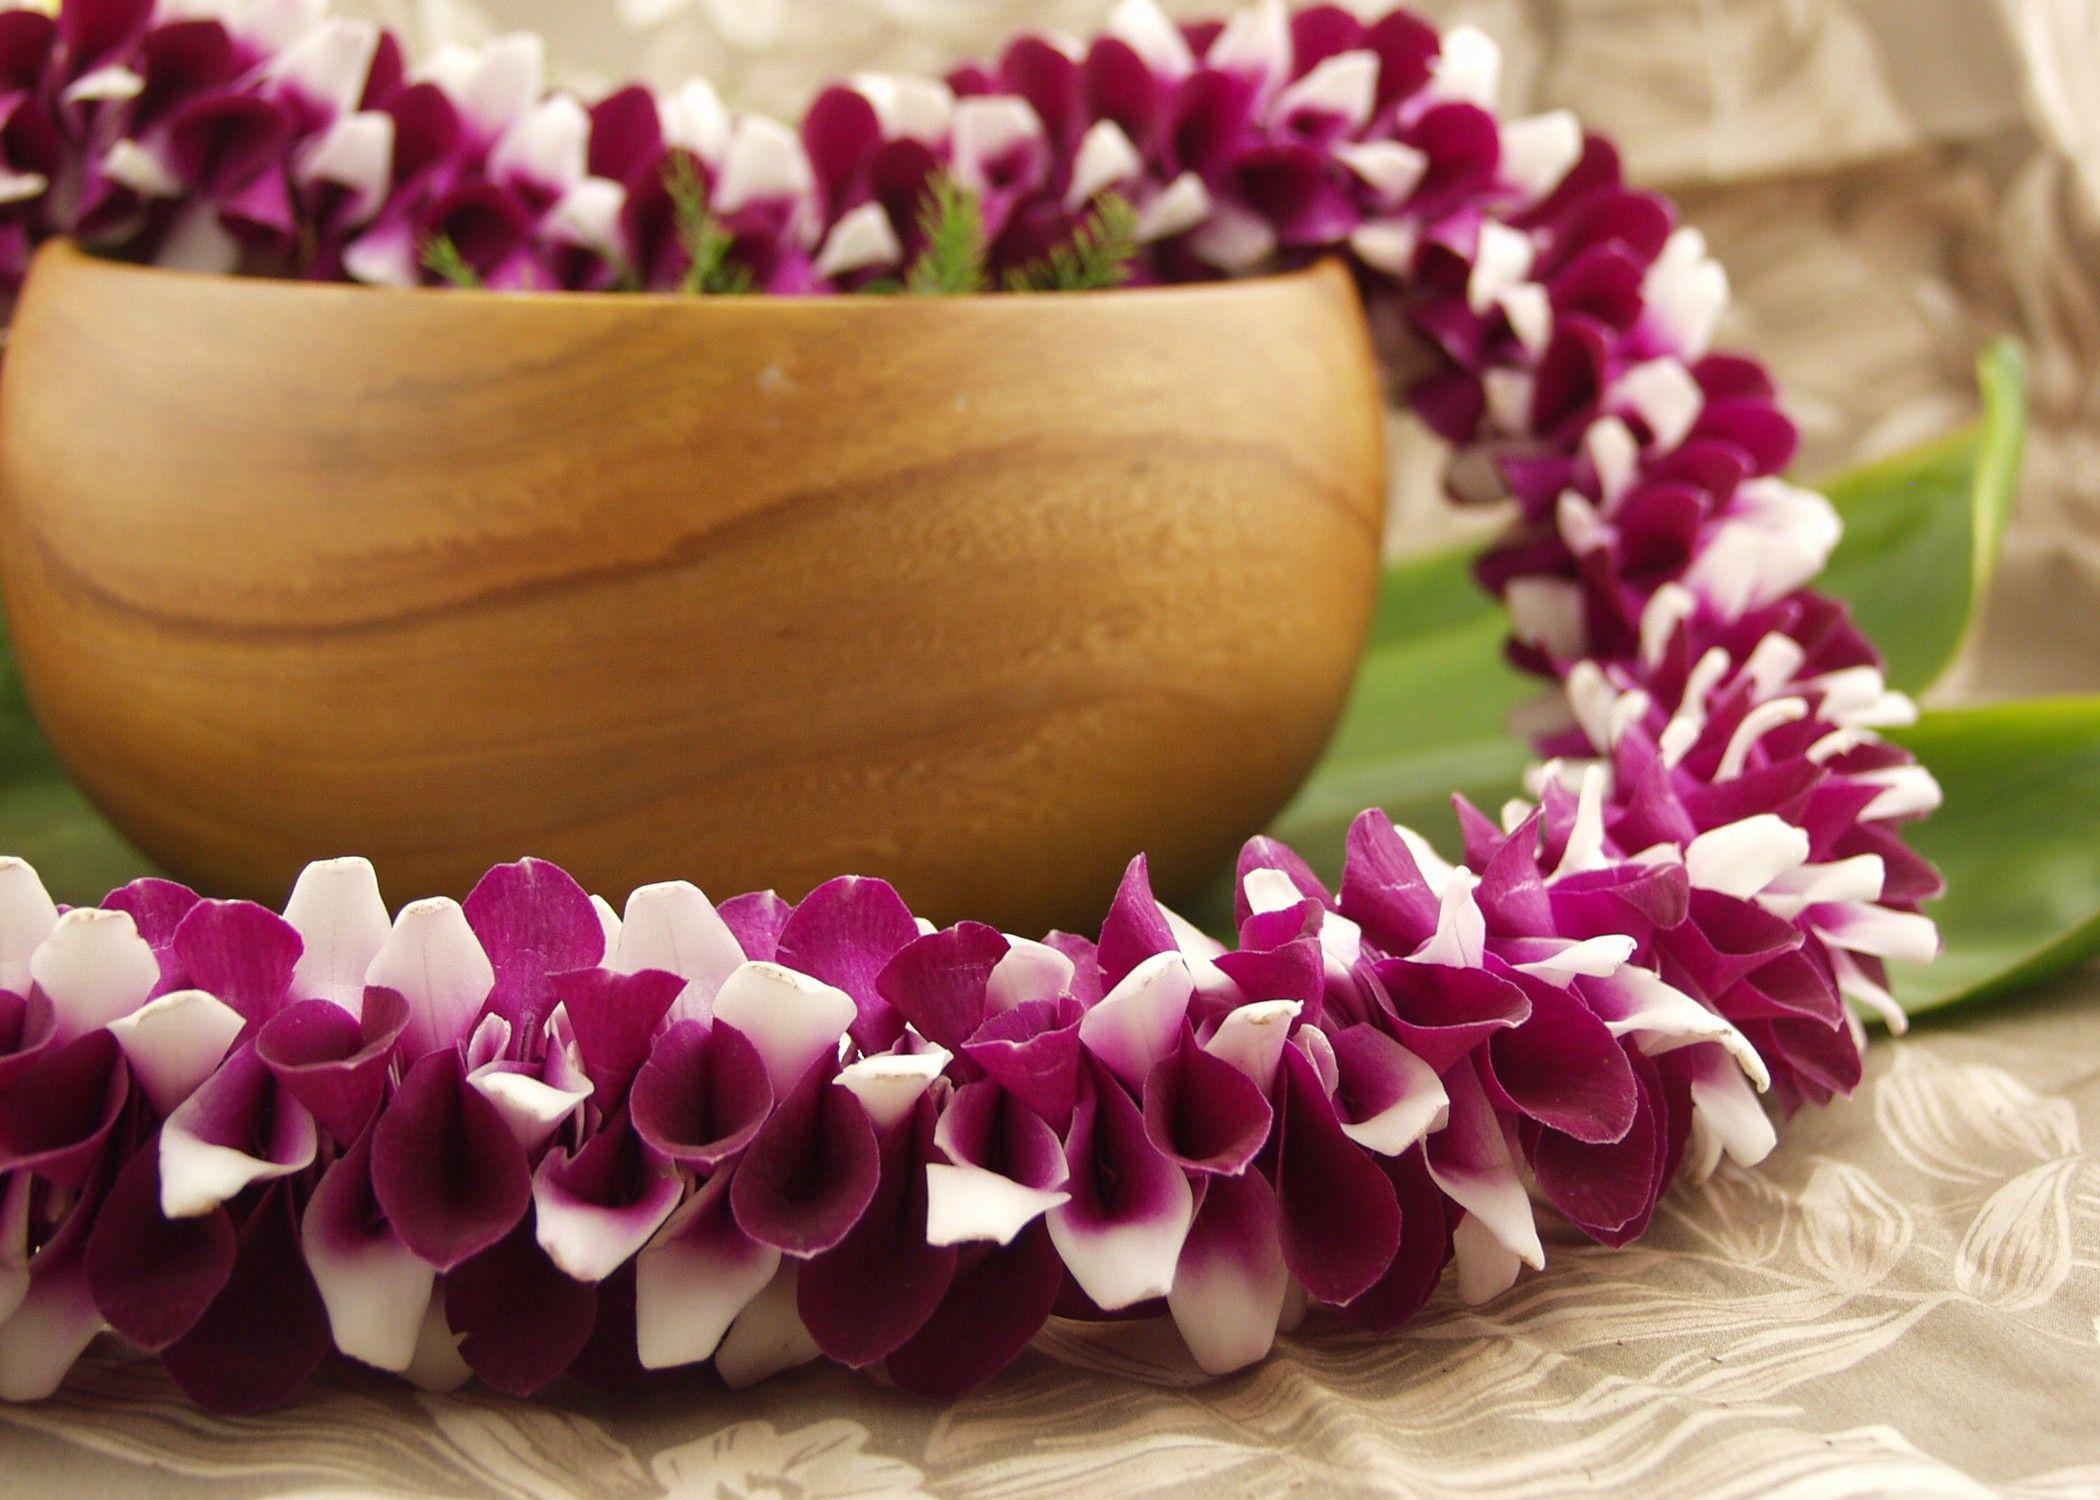 Pin by asayo on lei pinterest image search mixed double lei hawaiian thehawaiian flowershawaiian izmirmasajfo Gallery